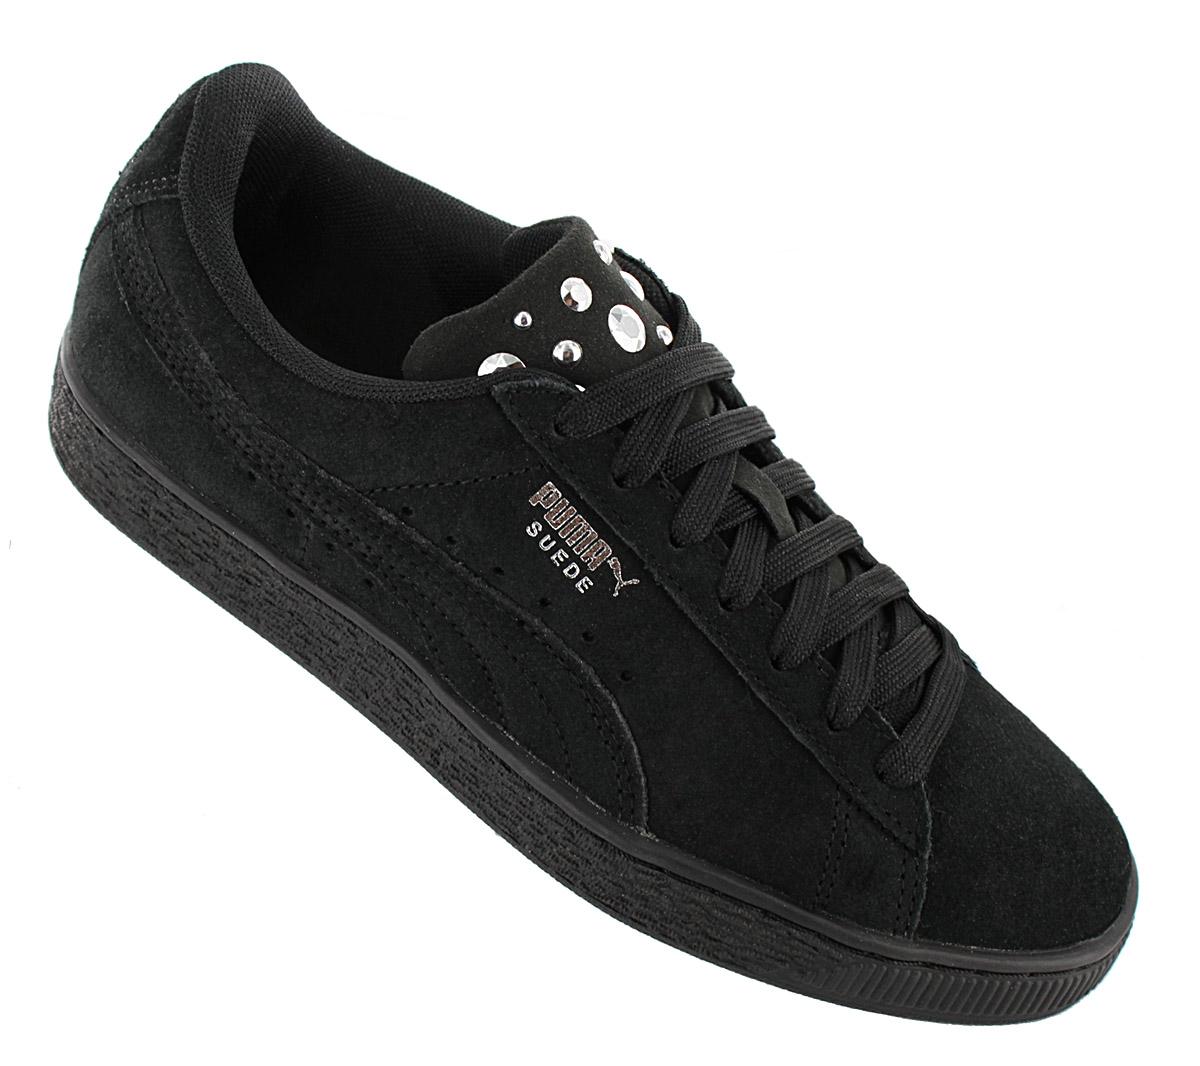 Details zu Puma Suede Jewel Damen Sneaker Schuhe 367273 01 Leder Schwarz Turnschuhe NEU